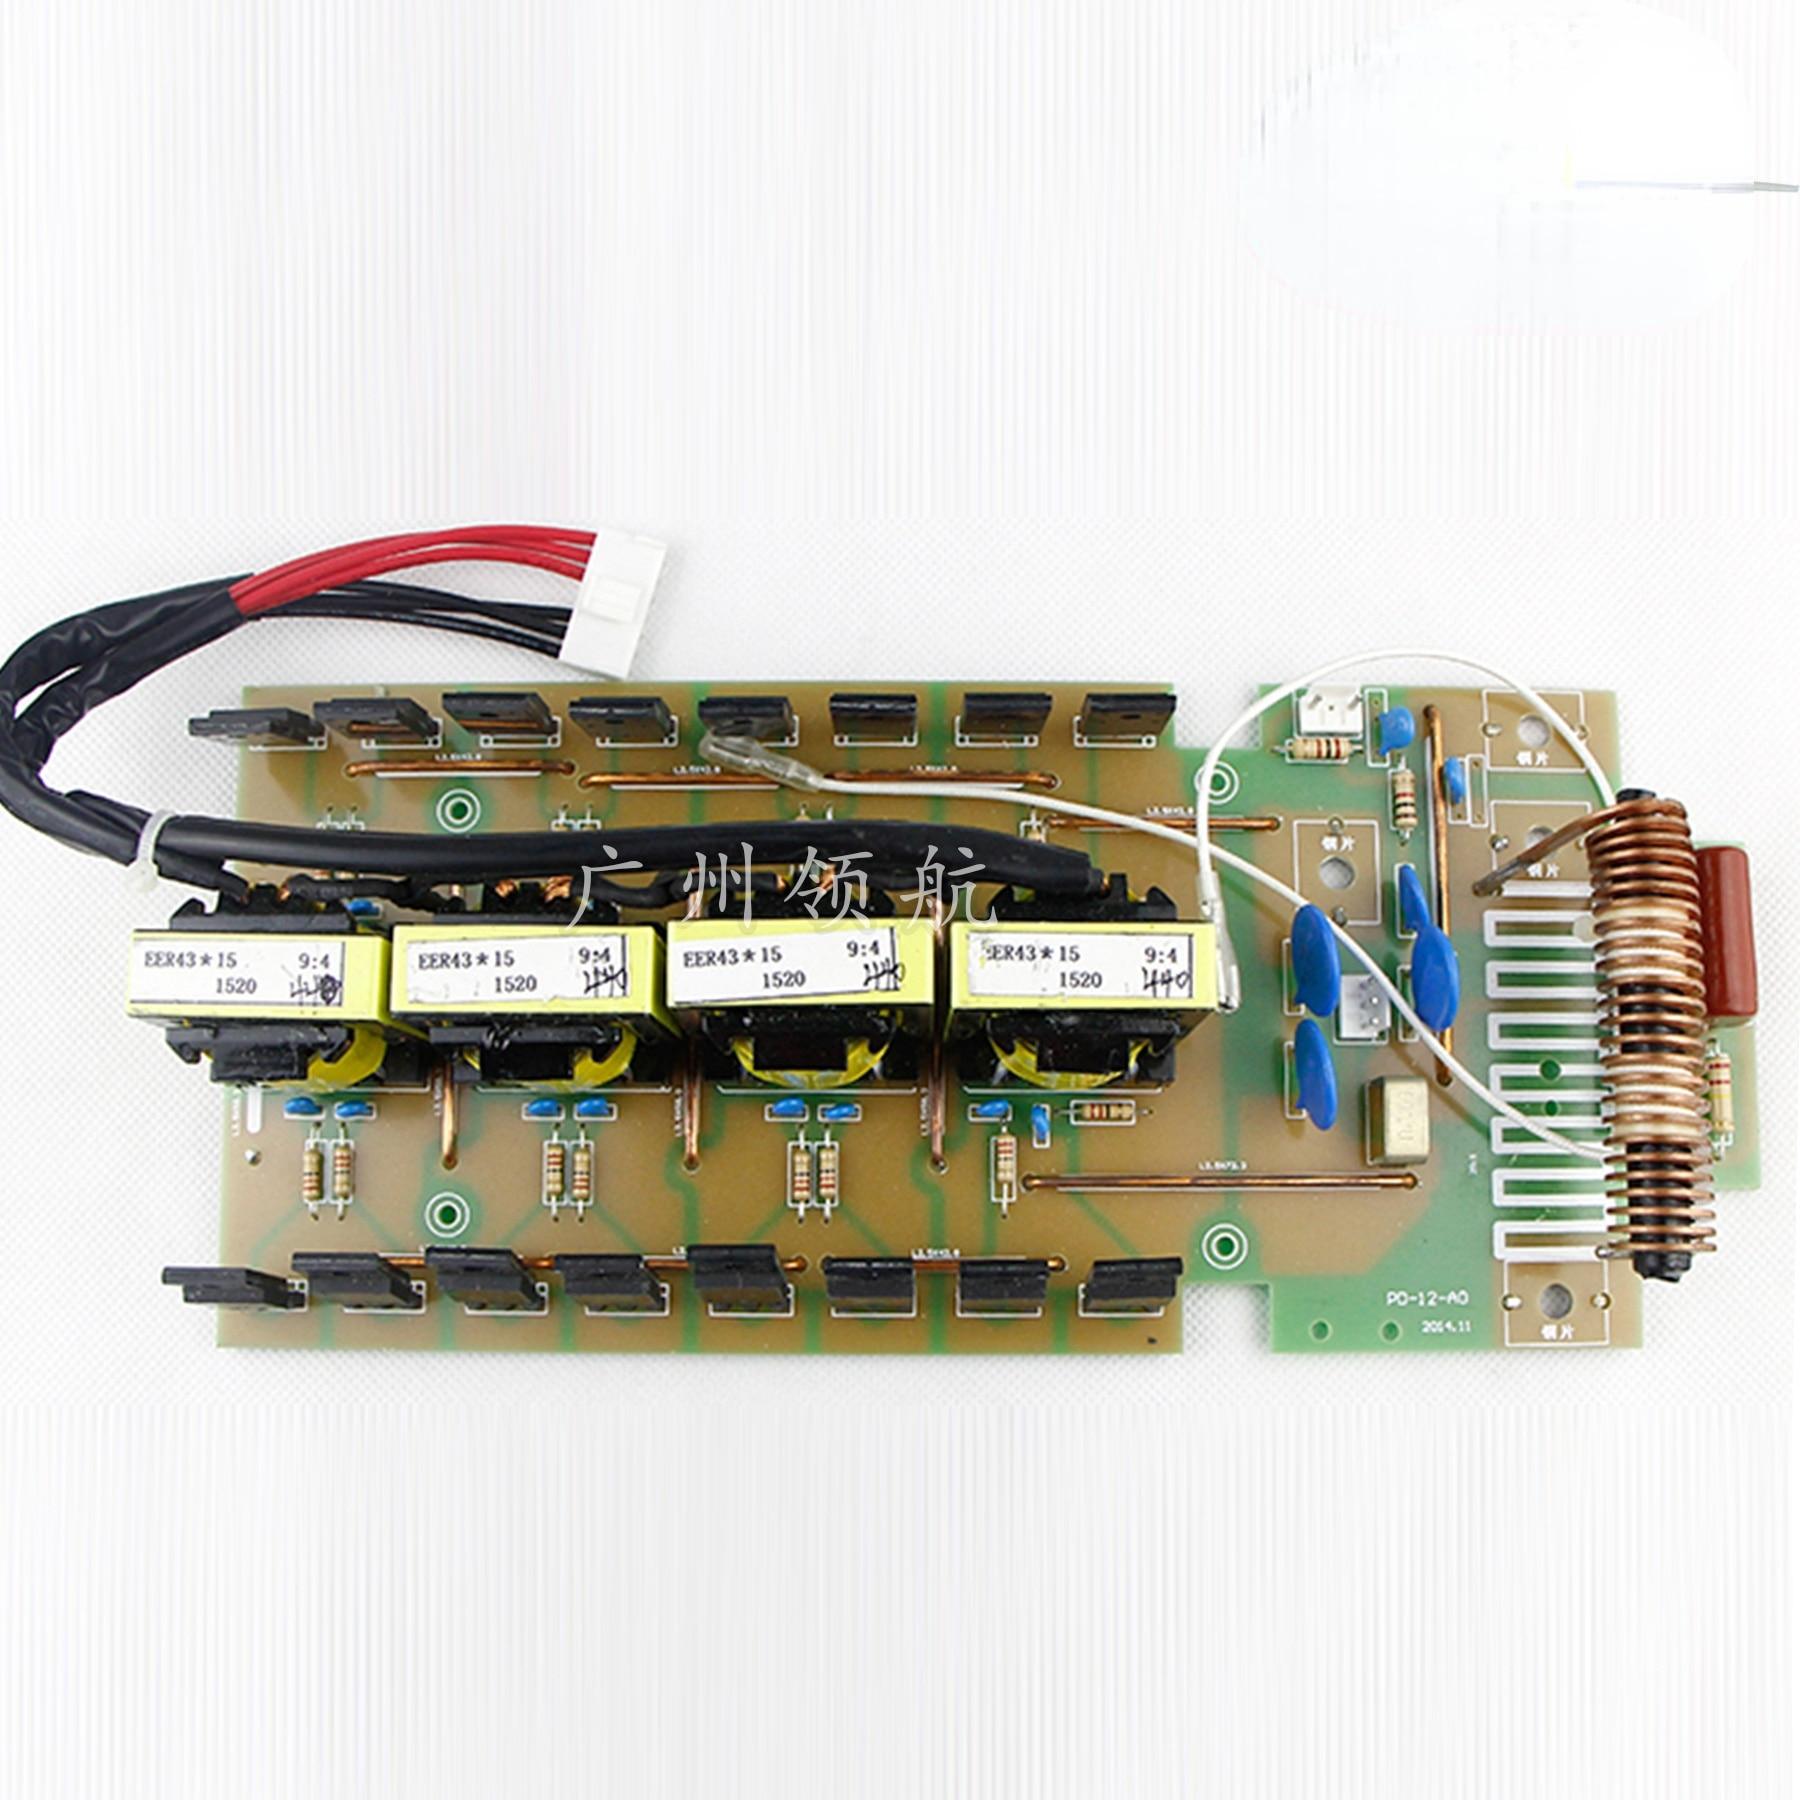 LGK/CUT-60/70 العاكس آلة قطع البلازما لوحة متوسطة لوحة دوائر كهربائية كاملة مع محول المعدل أنبوب